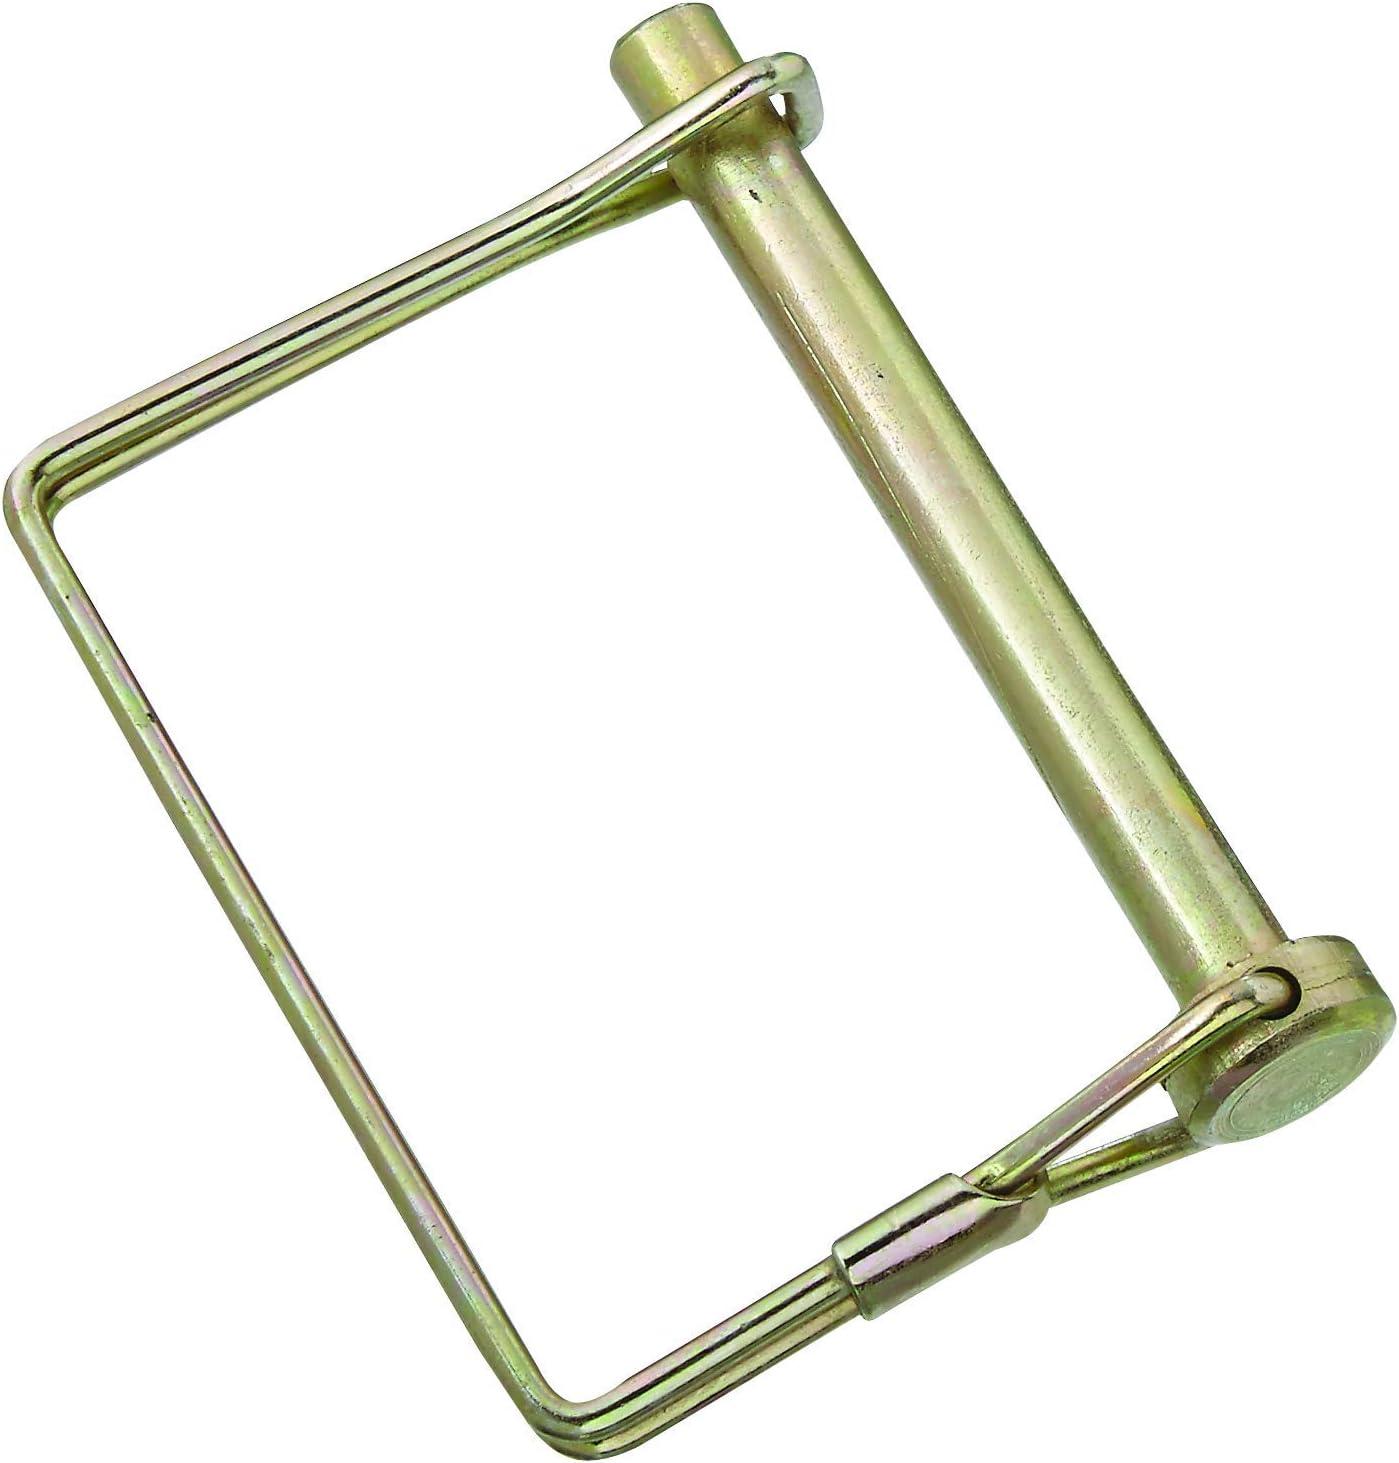 RV Designer 5//16 inch x 2-5//8 inch Collection H422 Safety Lock Pin 5//16 X 2-5//8